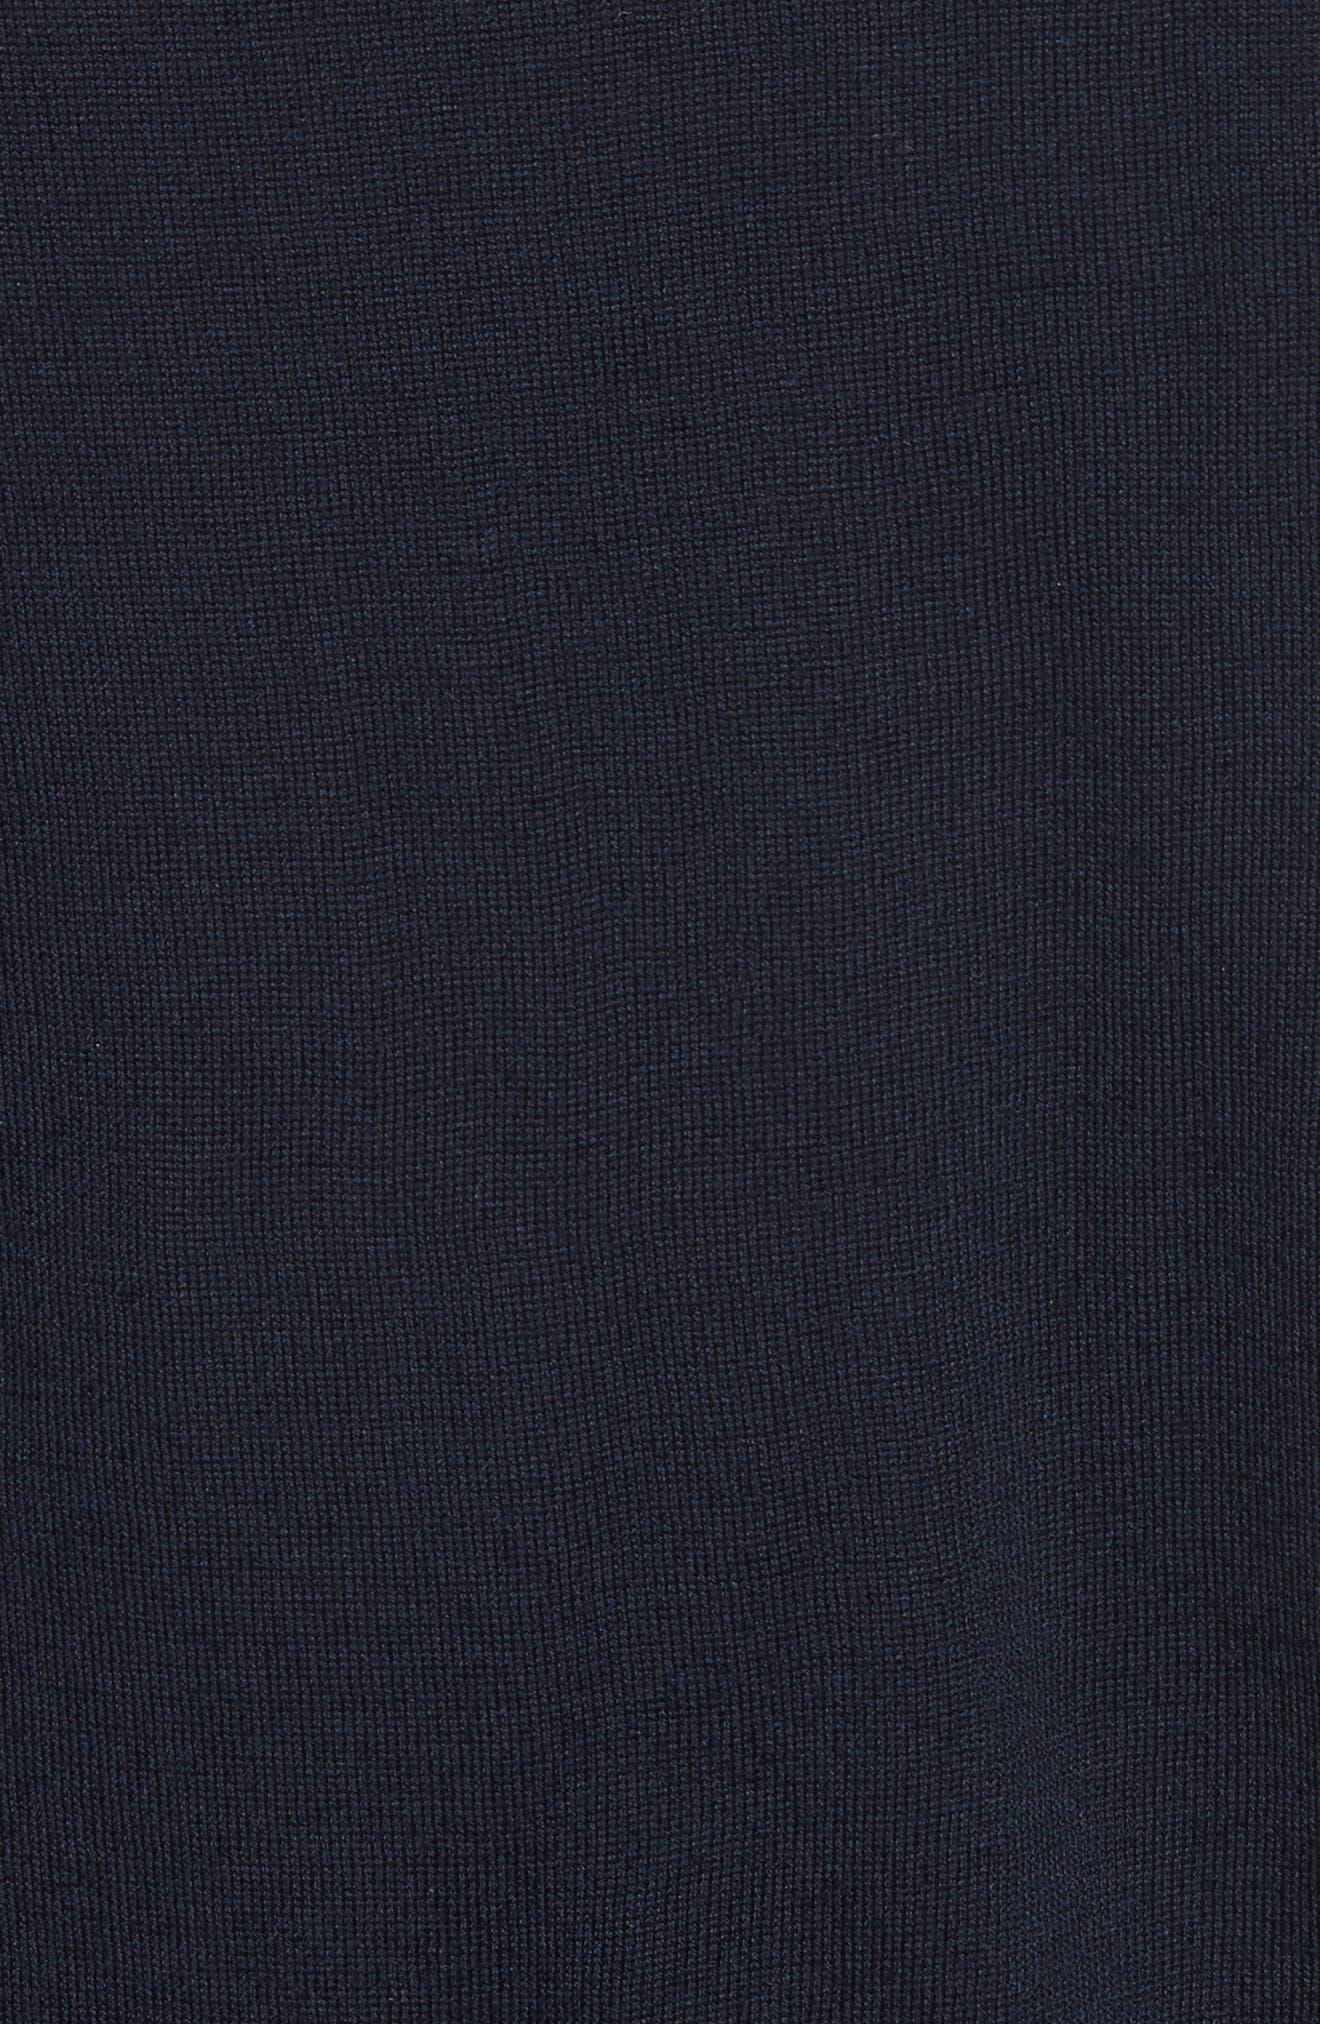 Sigfred Merino Wool & Silk Crewneck Sweater,                             Alternate thumbnail 5, color,                             412